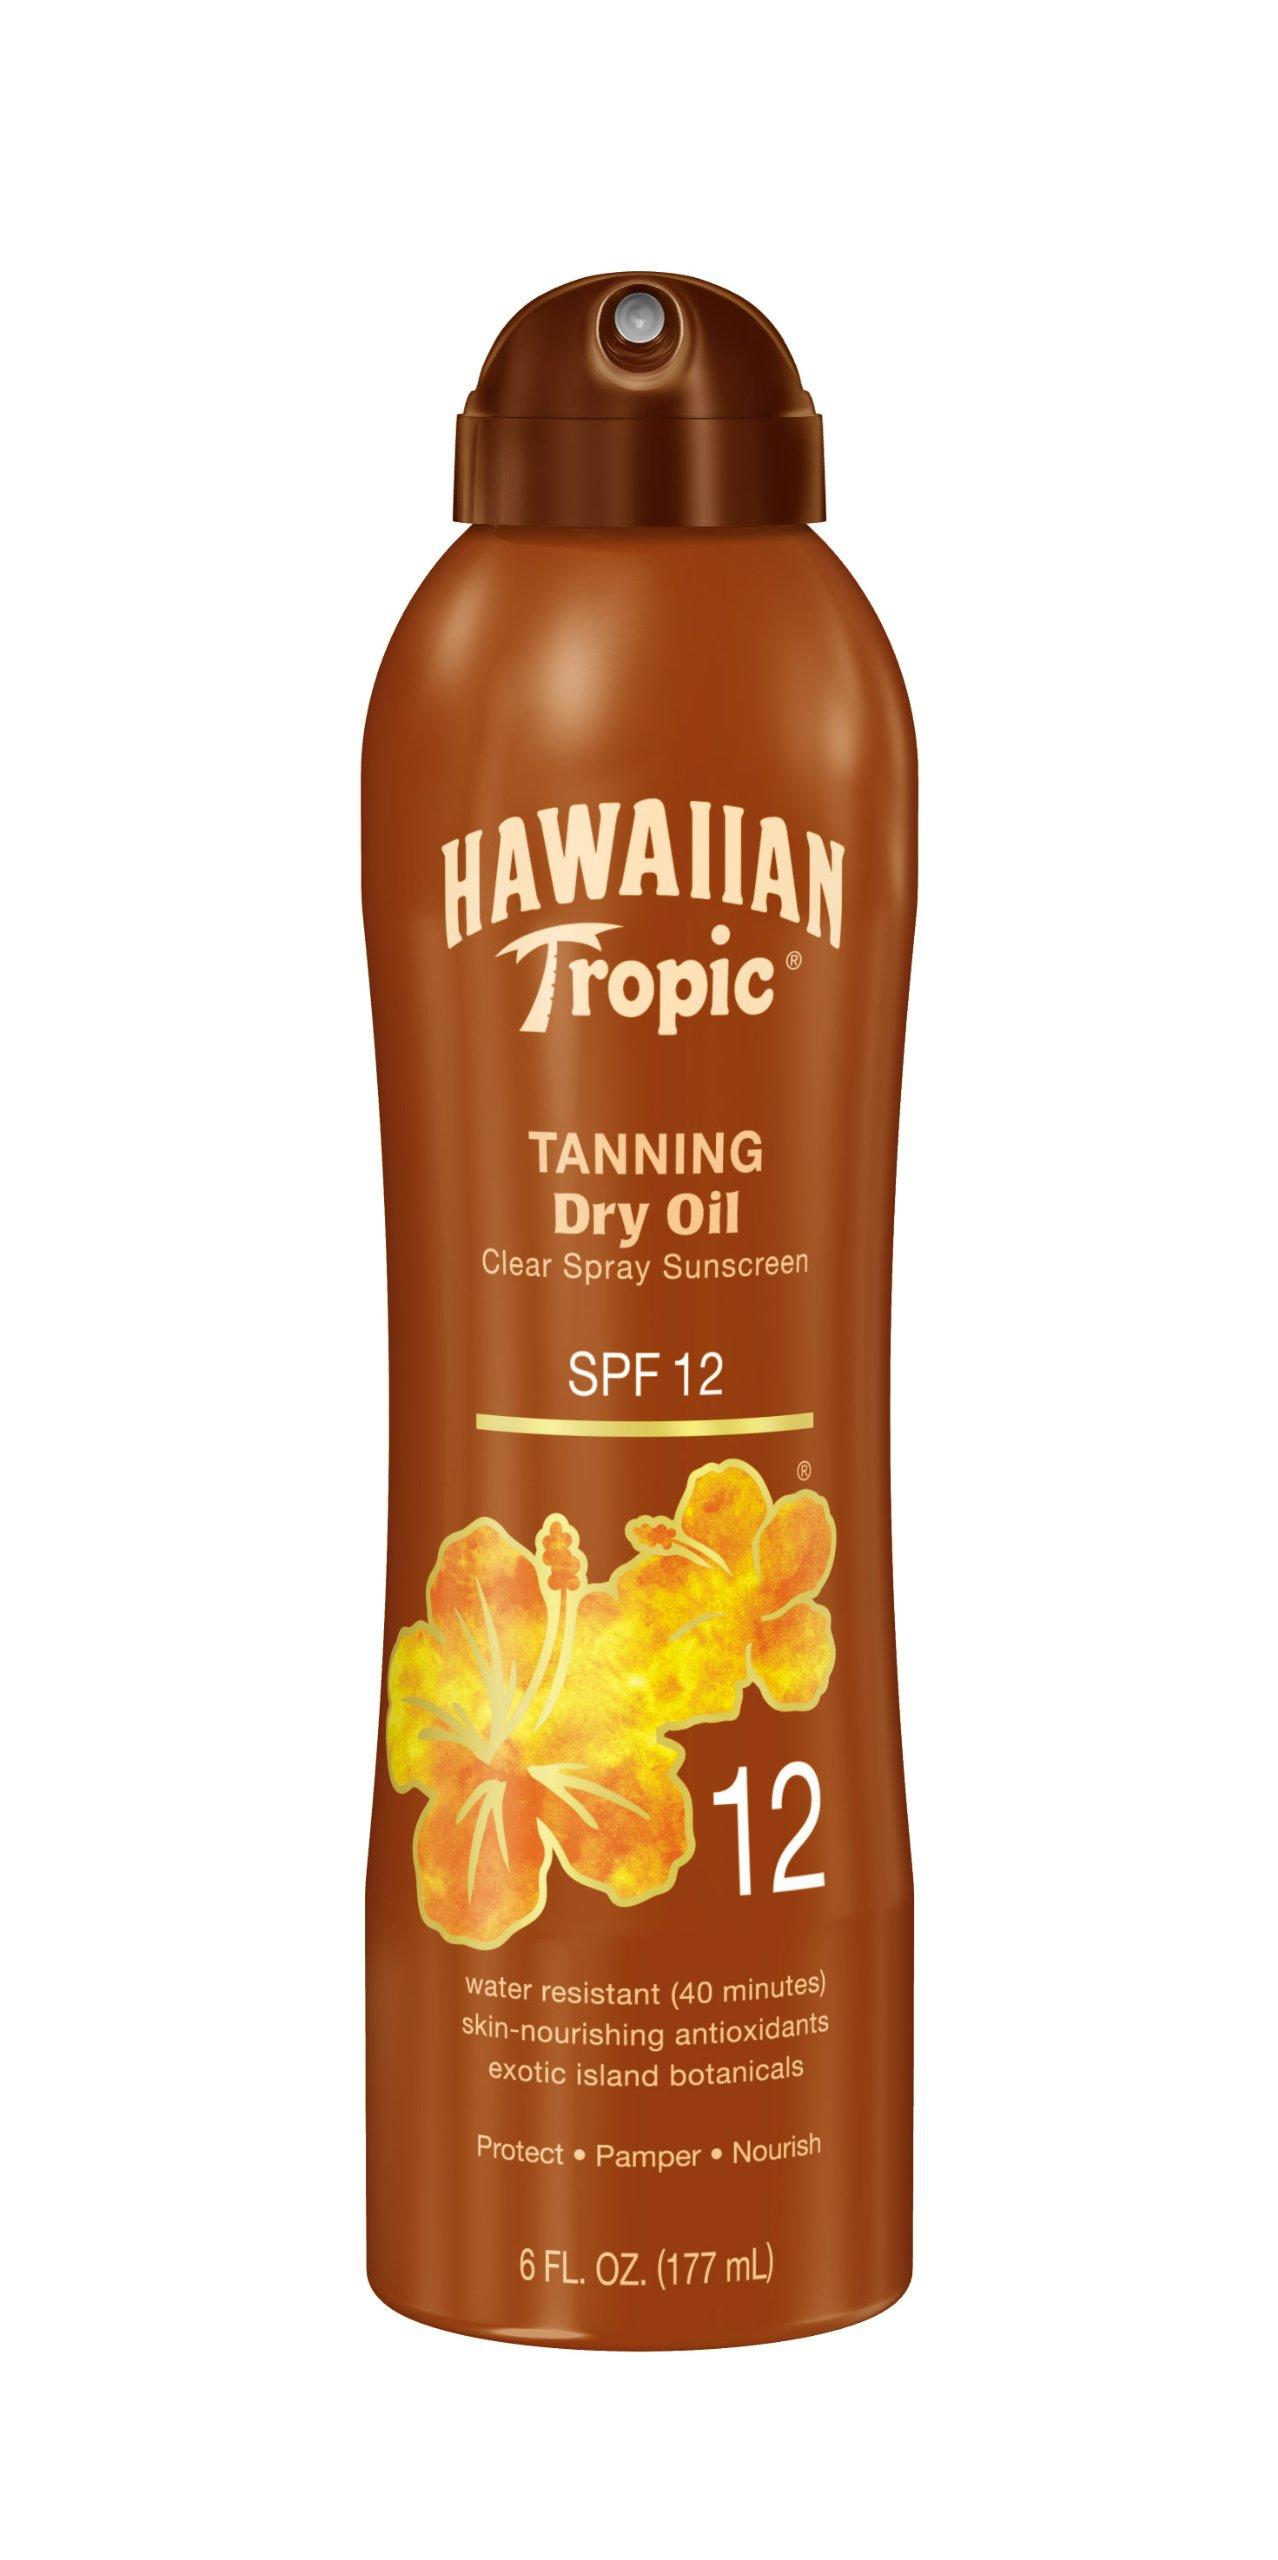 Hawaiian Tropic Tanning Dry Oil Clear Spray Sunscreen SPF 12 6 oz (Pack of 3) by Hawaiian Tropic